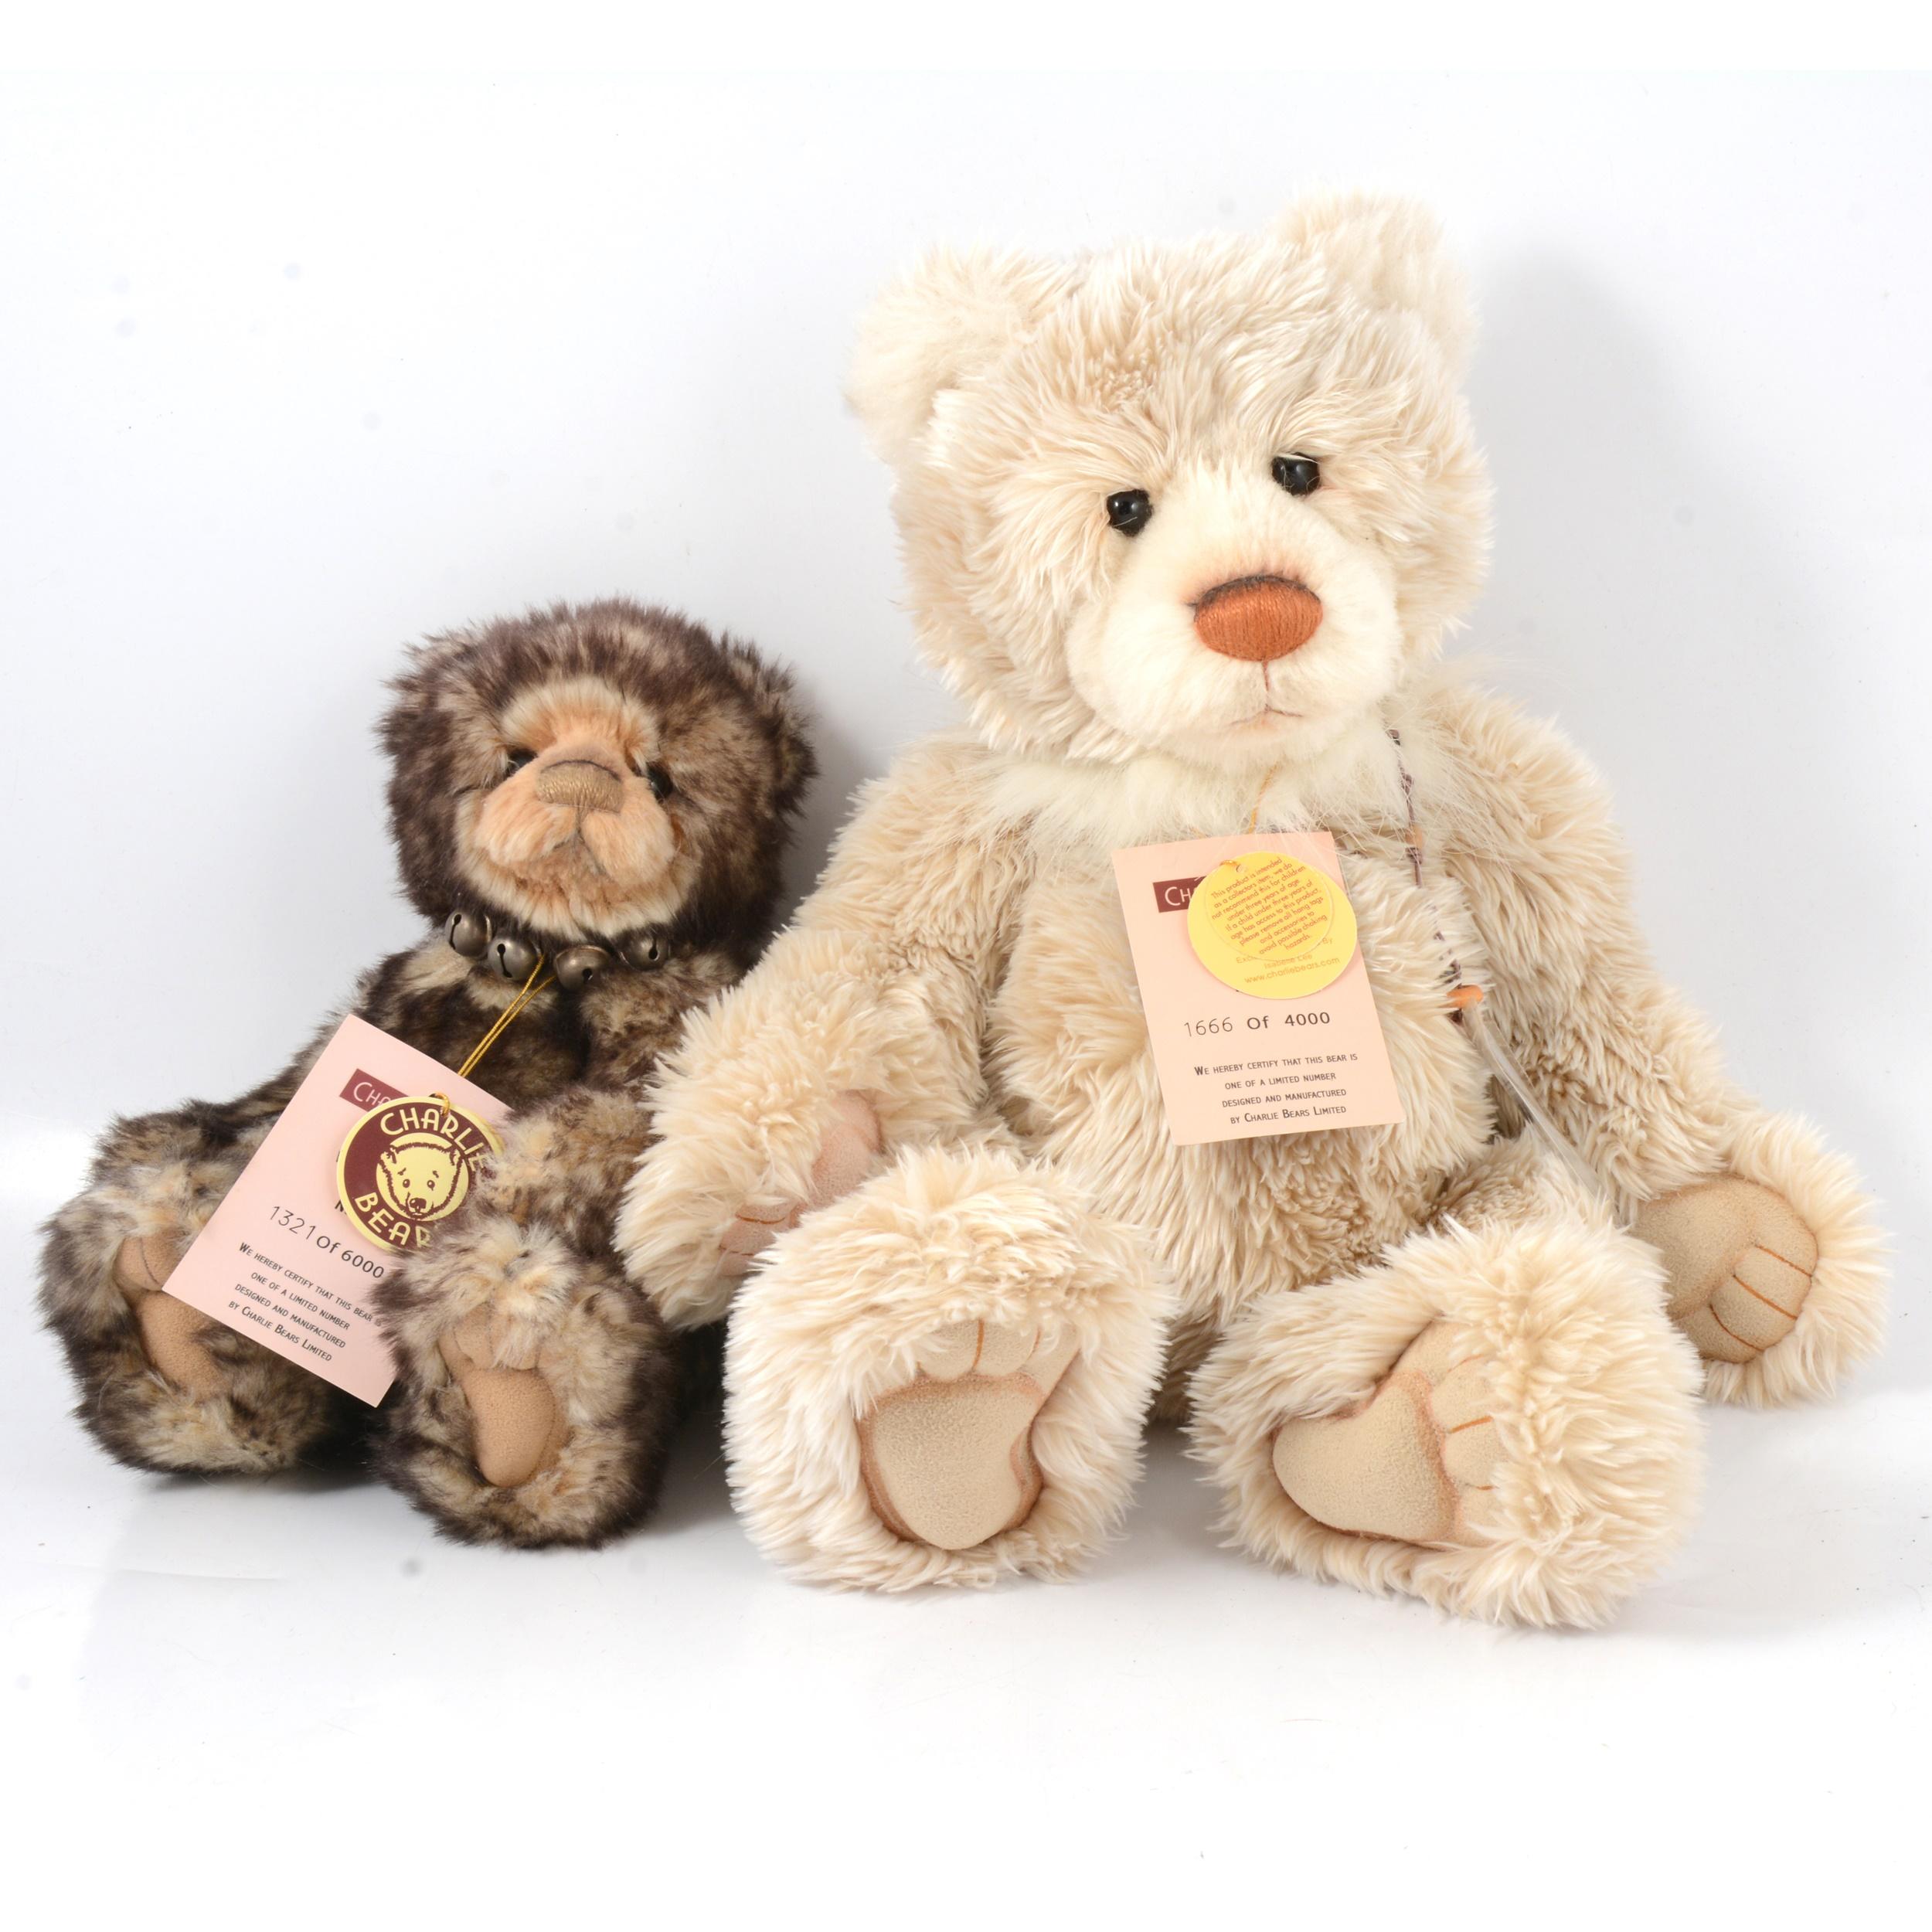 Two Charlie Teddy Bears, Wurve You and Porridge.